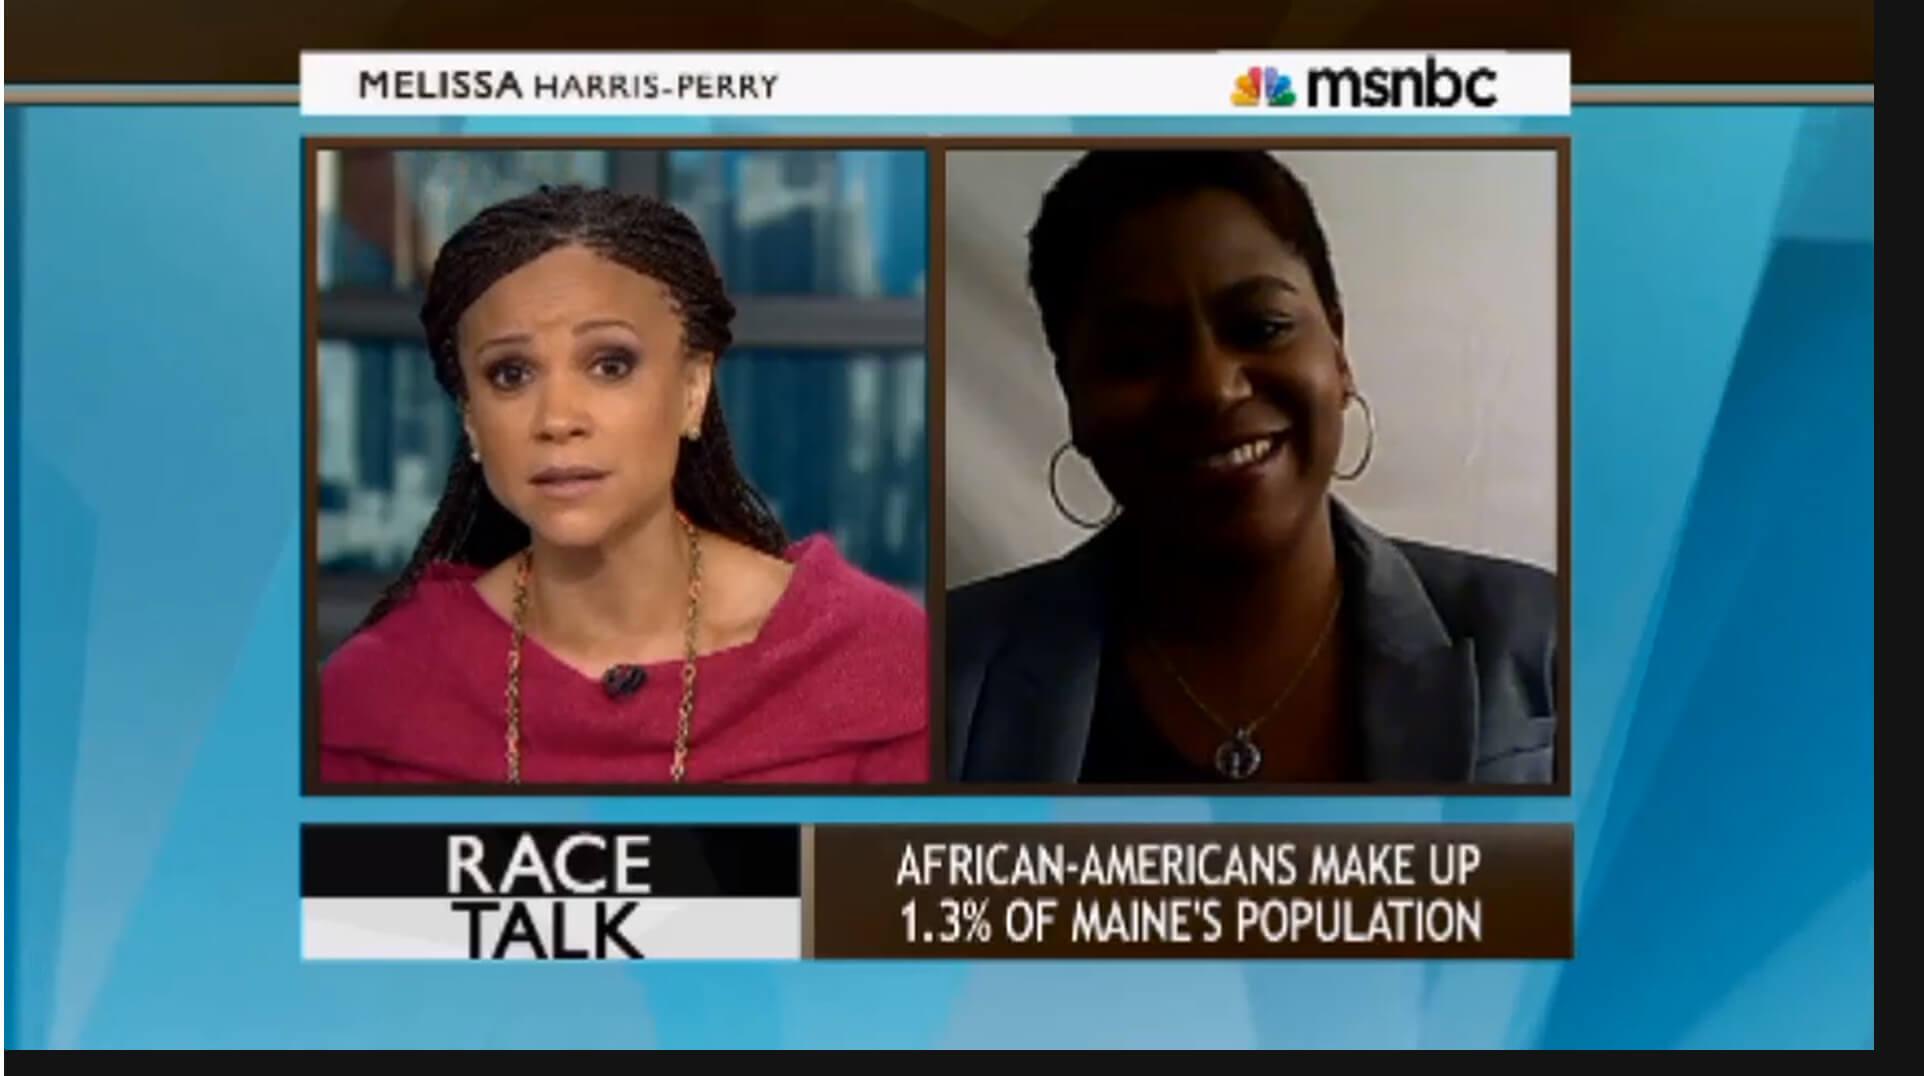 MSNBC Melissa Harris-Perry